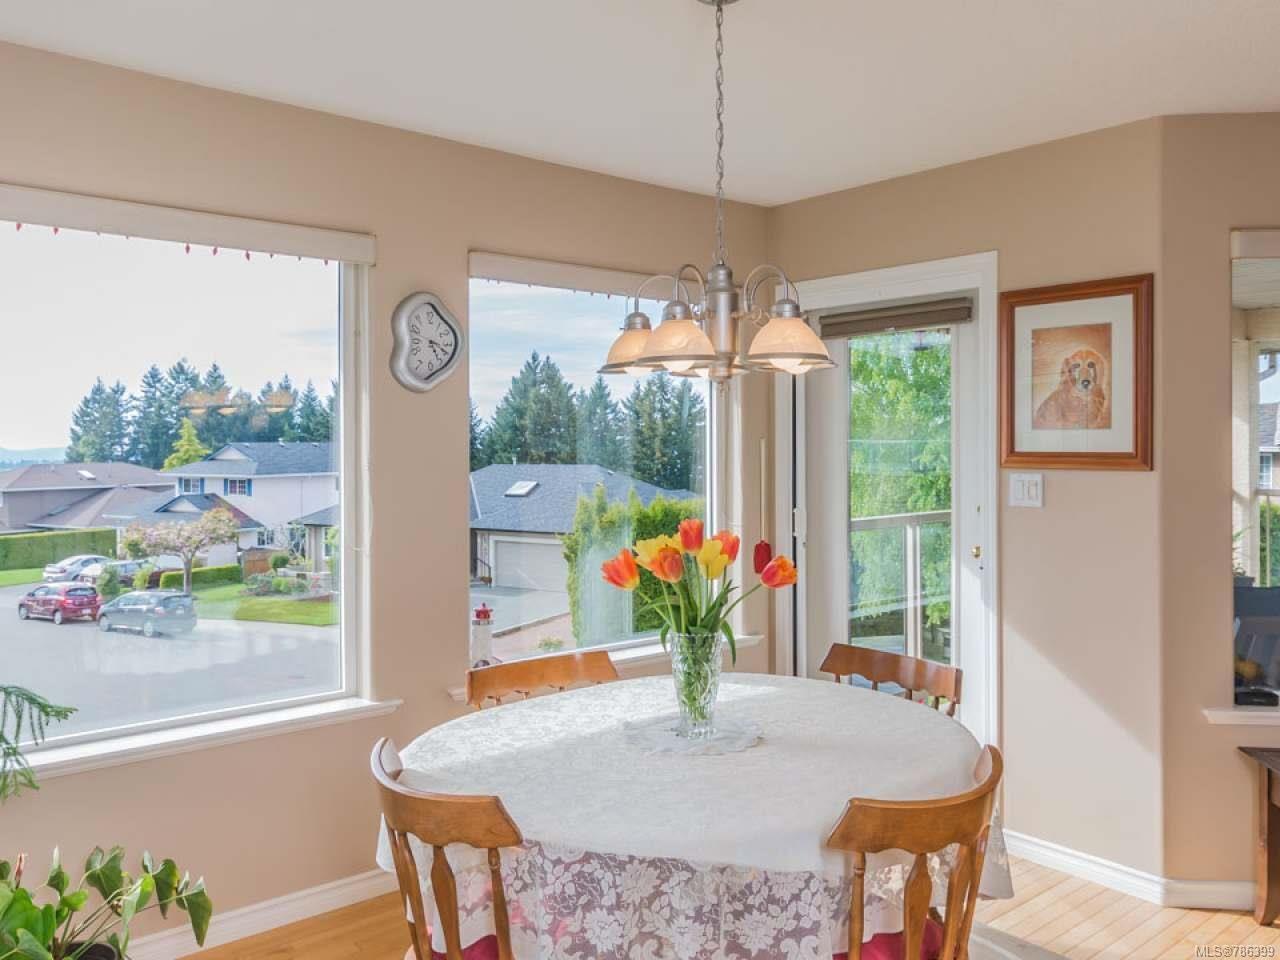 Photo 5: Photos: 5371 HIGHRIDGE PLACE in NANAIMO: Na North Nanaimo House for sale (Nanaimo)  : MLS®# 786399